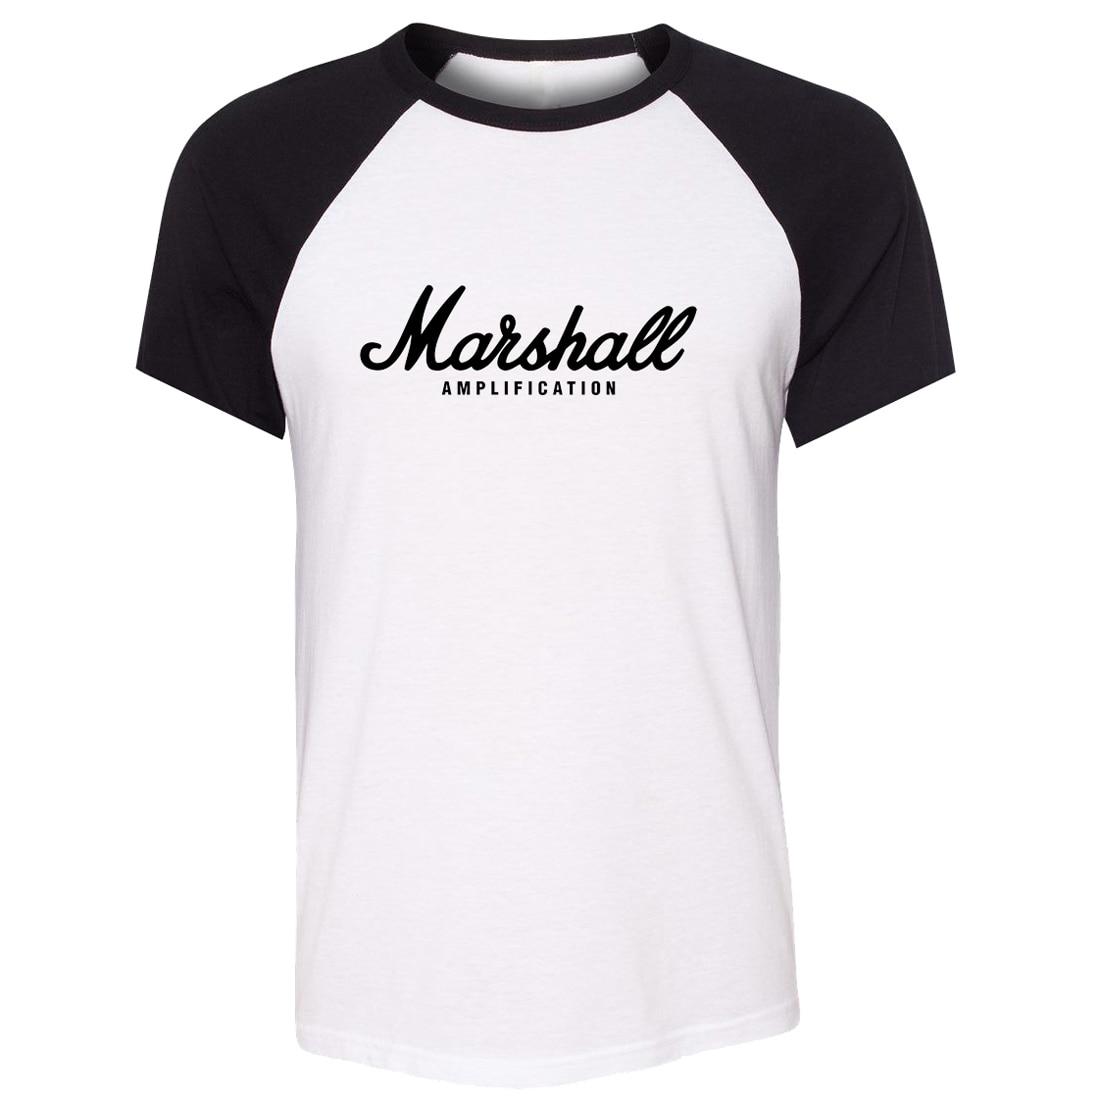 b37a1cd0680 Raglan Short Sleeve Men T shirt MARSHALL Amps Amplifiers Amplification  Guitar Art Pattern T shirt Unisex Summer Casual Tee Tops-in T-Shirts from  Men s ...